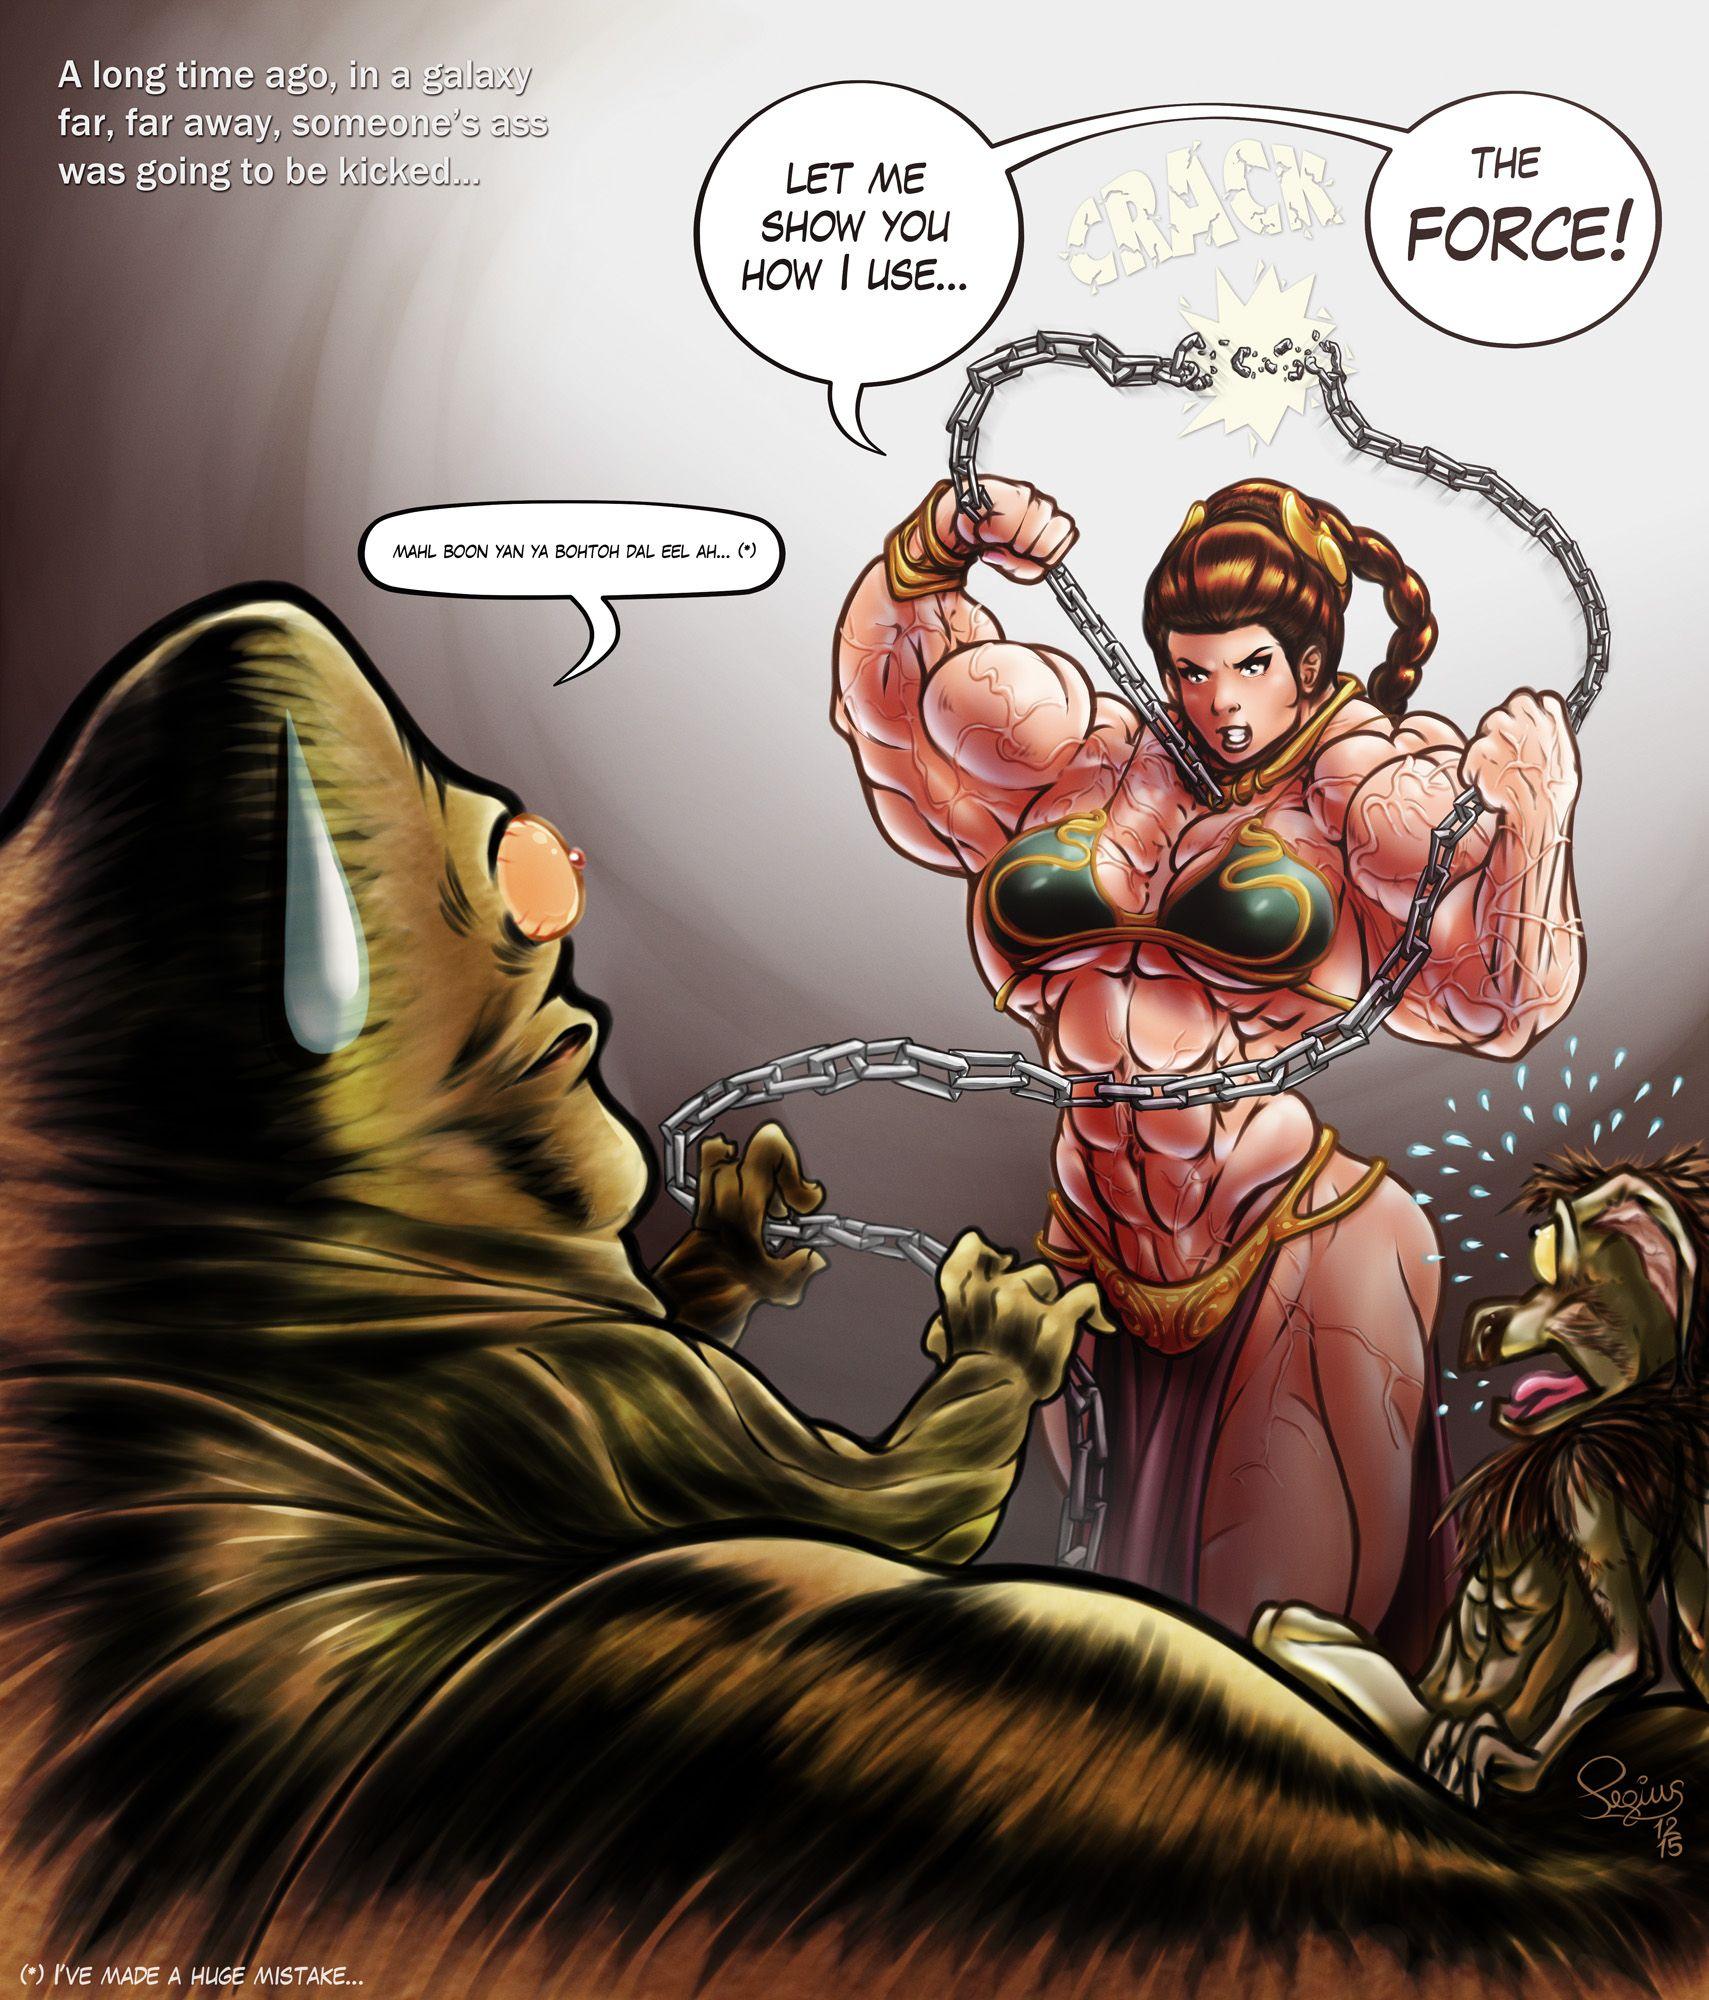 princes leia of star wars naked